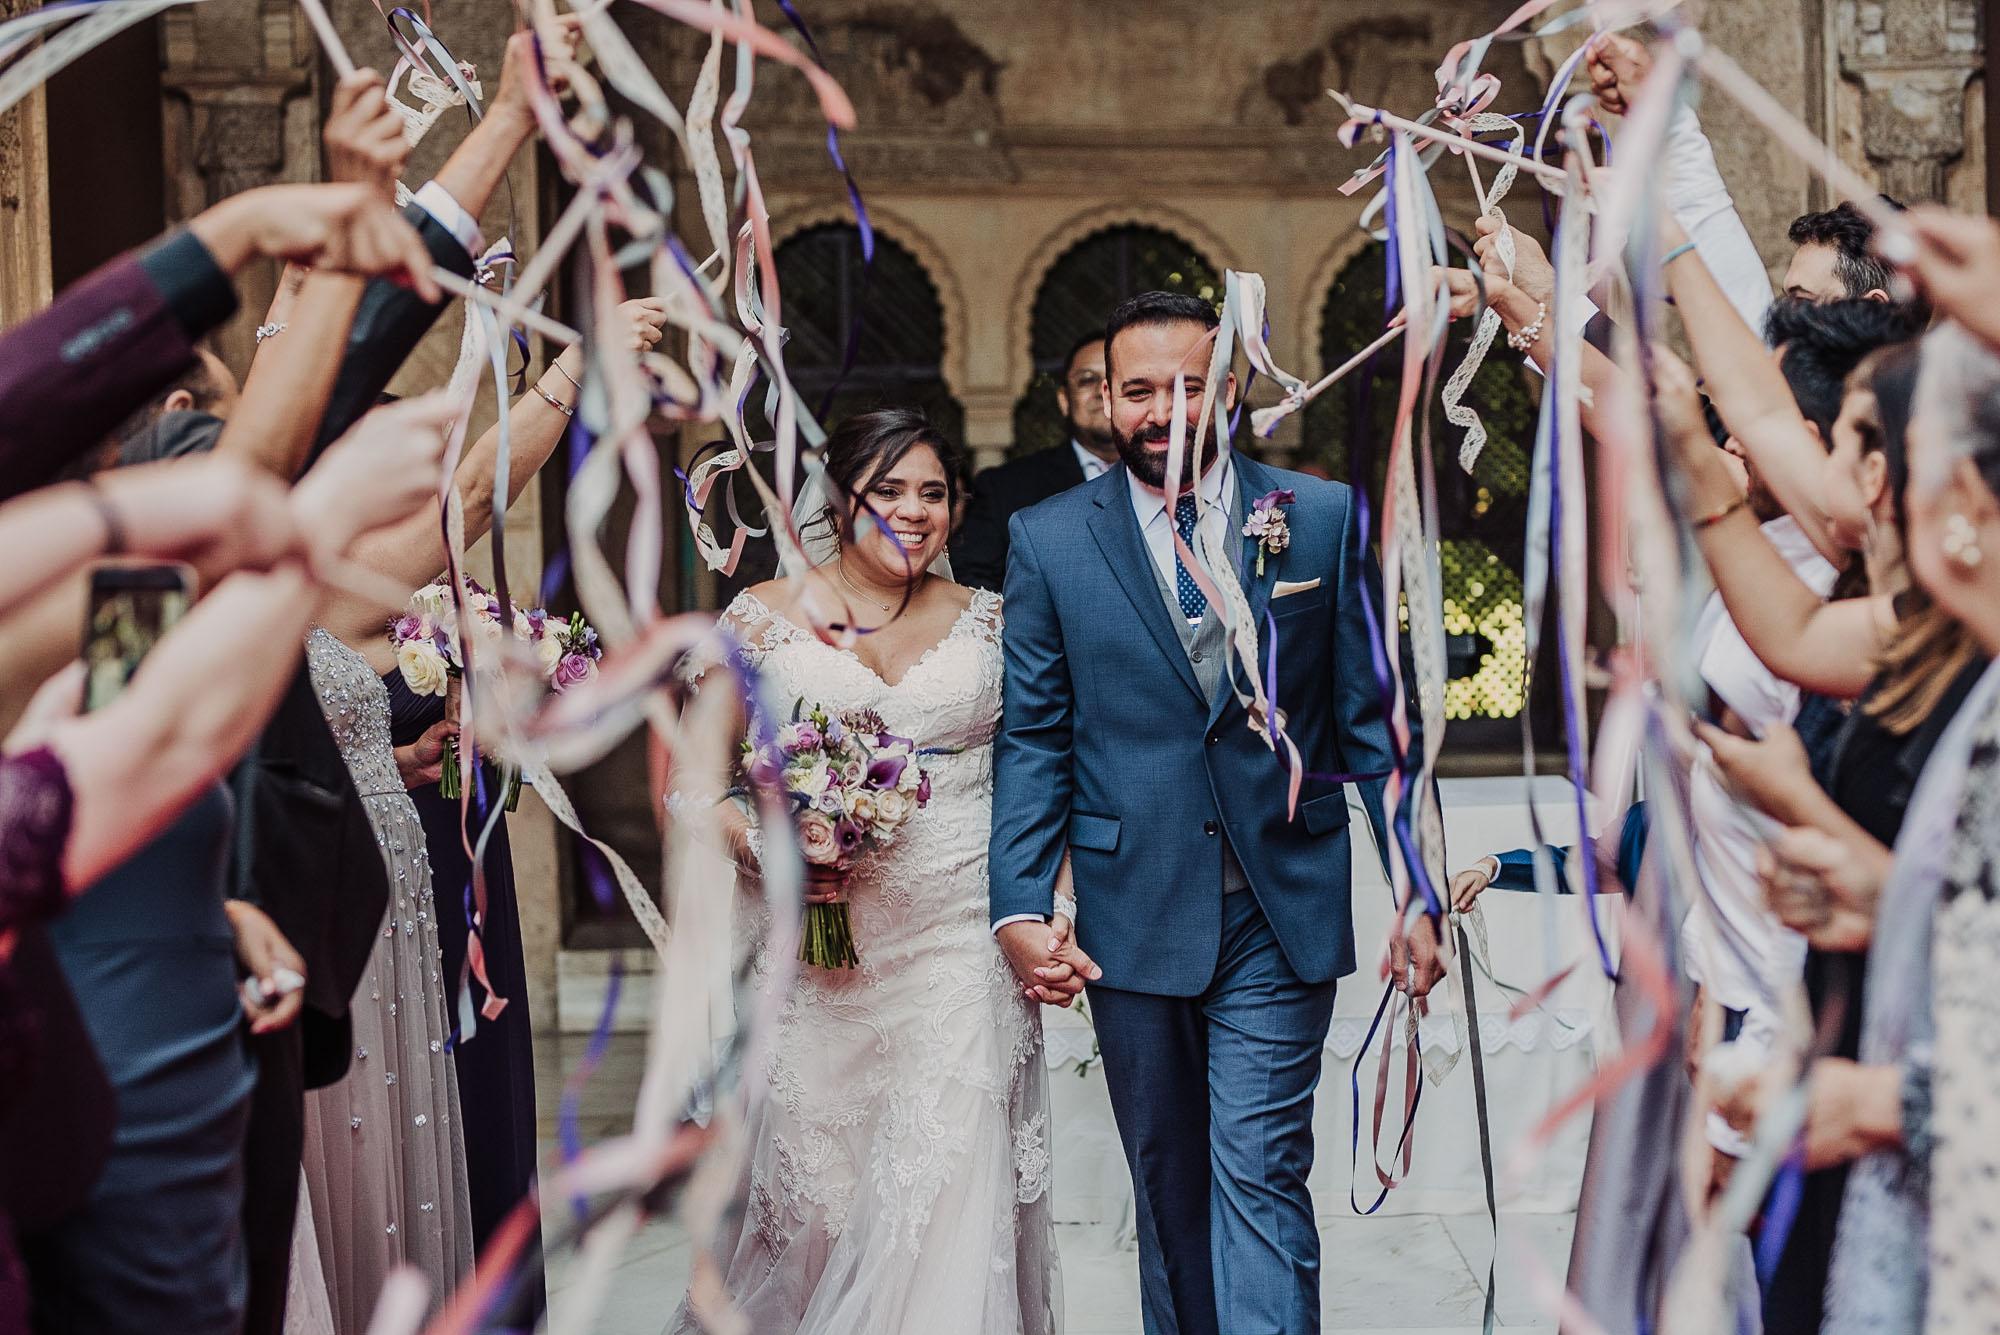 Wedding at the Parador of Granada. Wedding Photographer in Granada. Fran Ménez. Principal